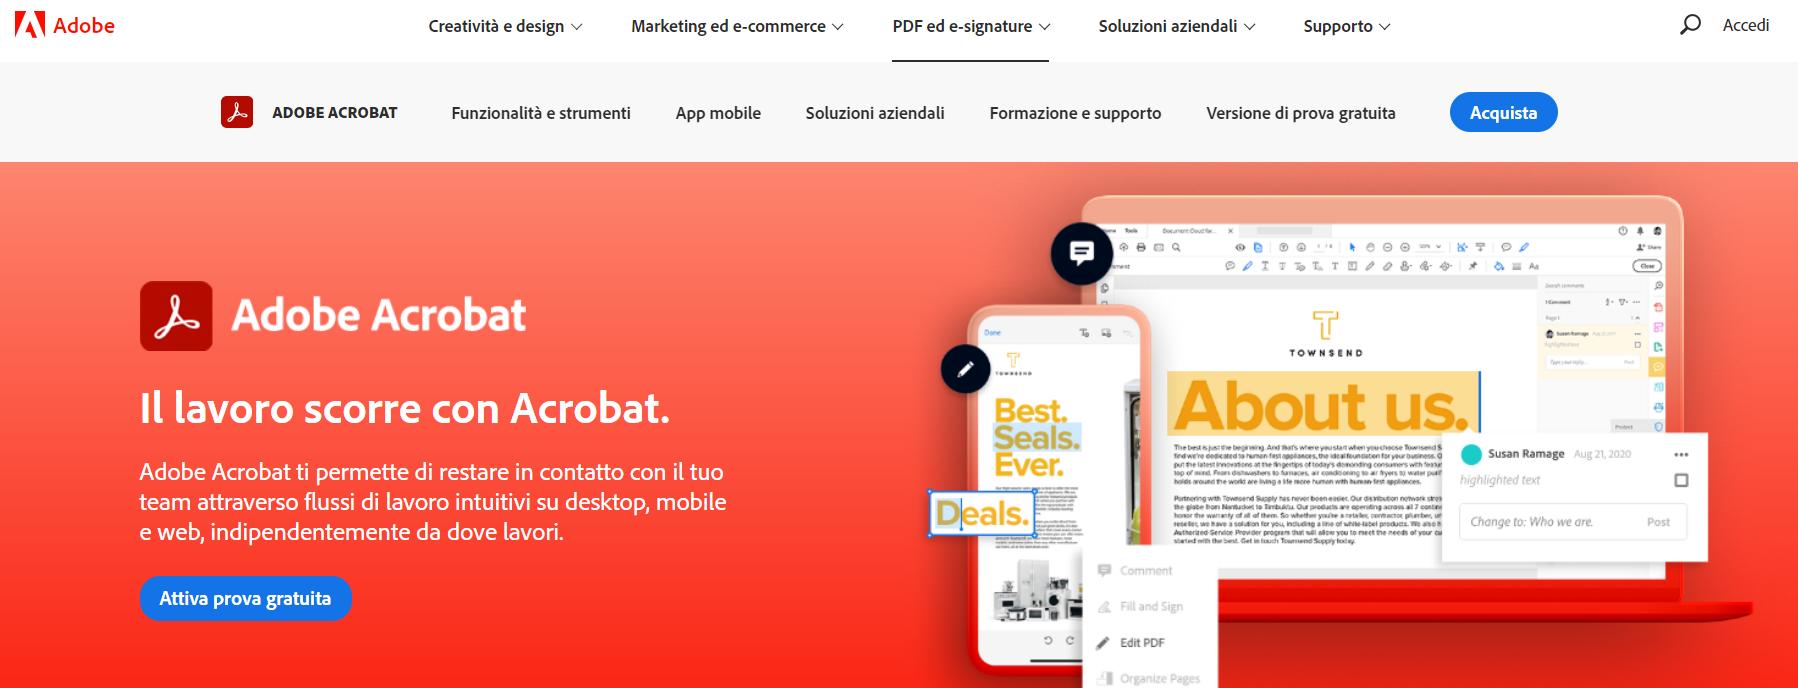 Adobe Acrobat home page